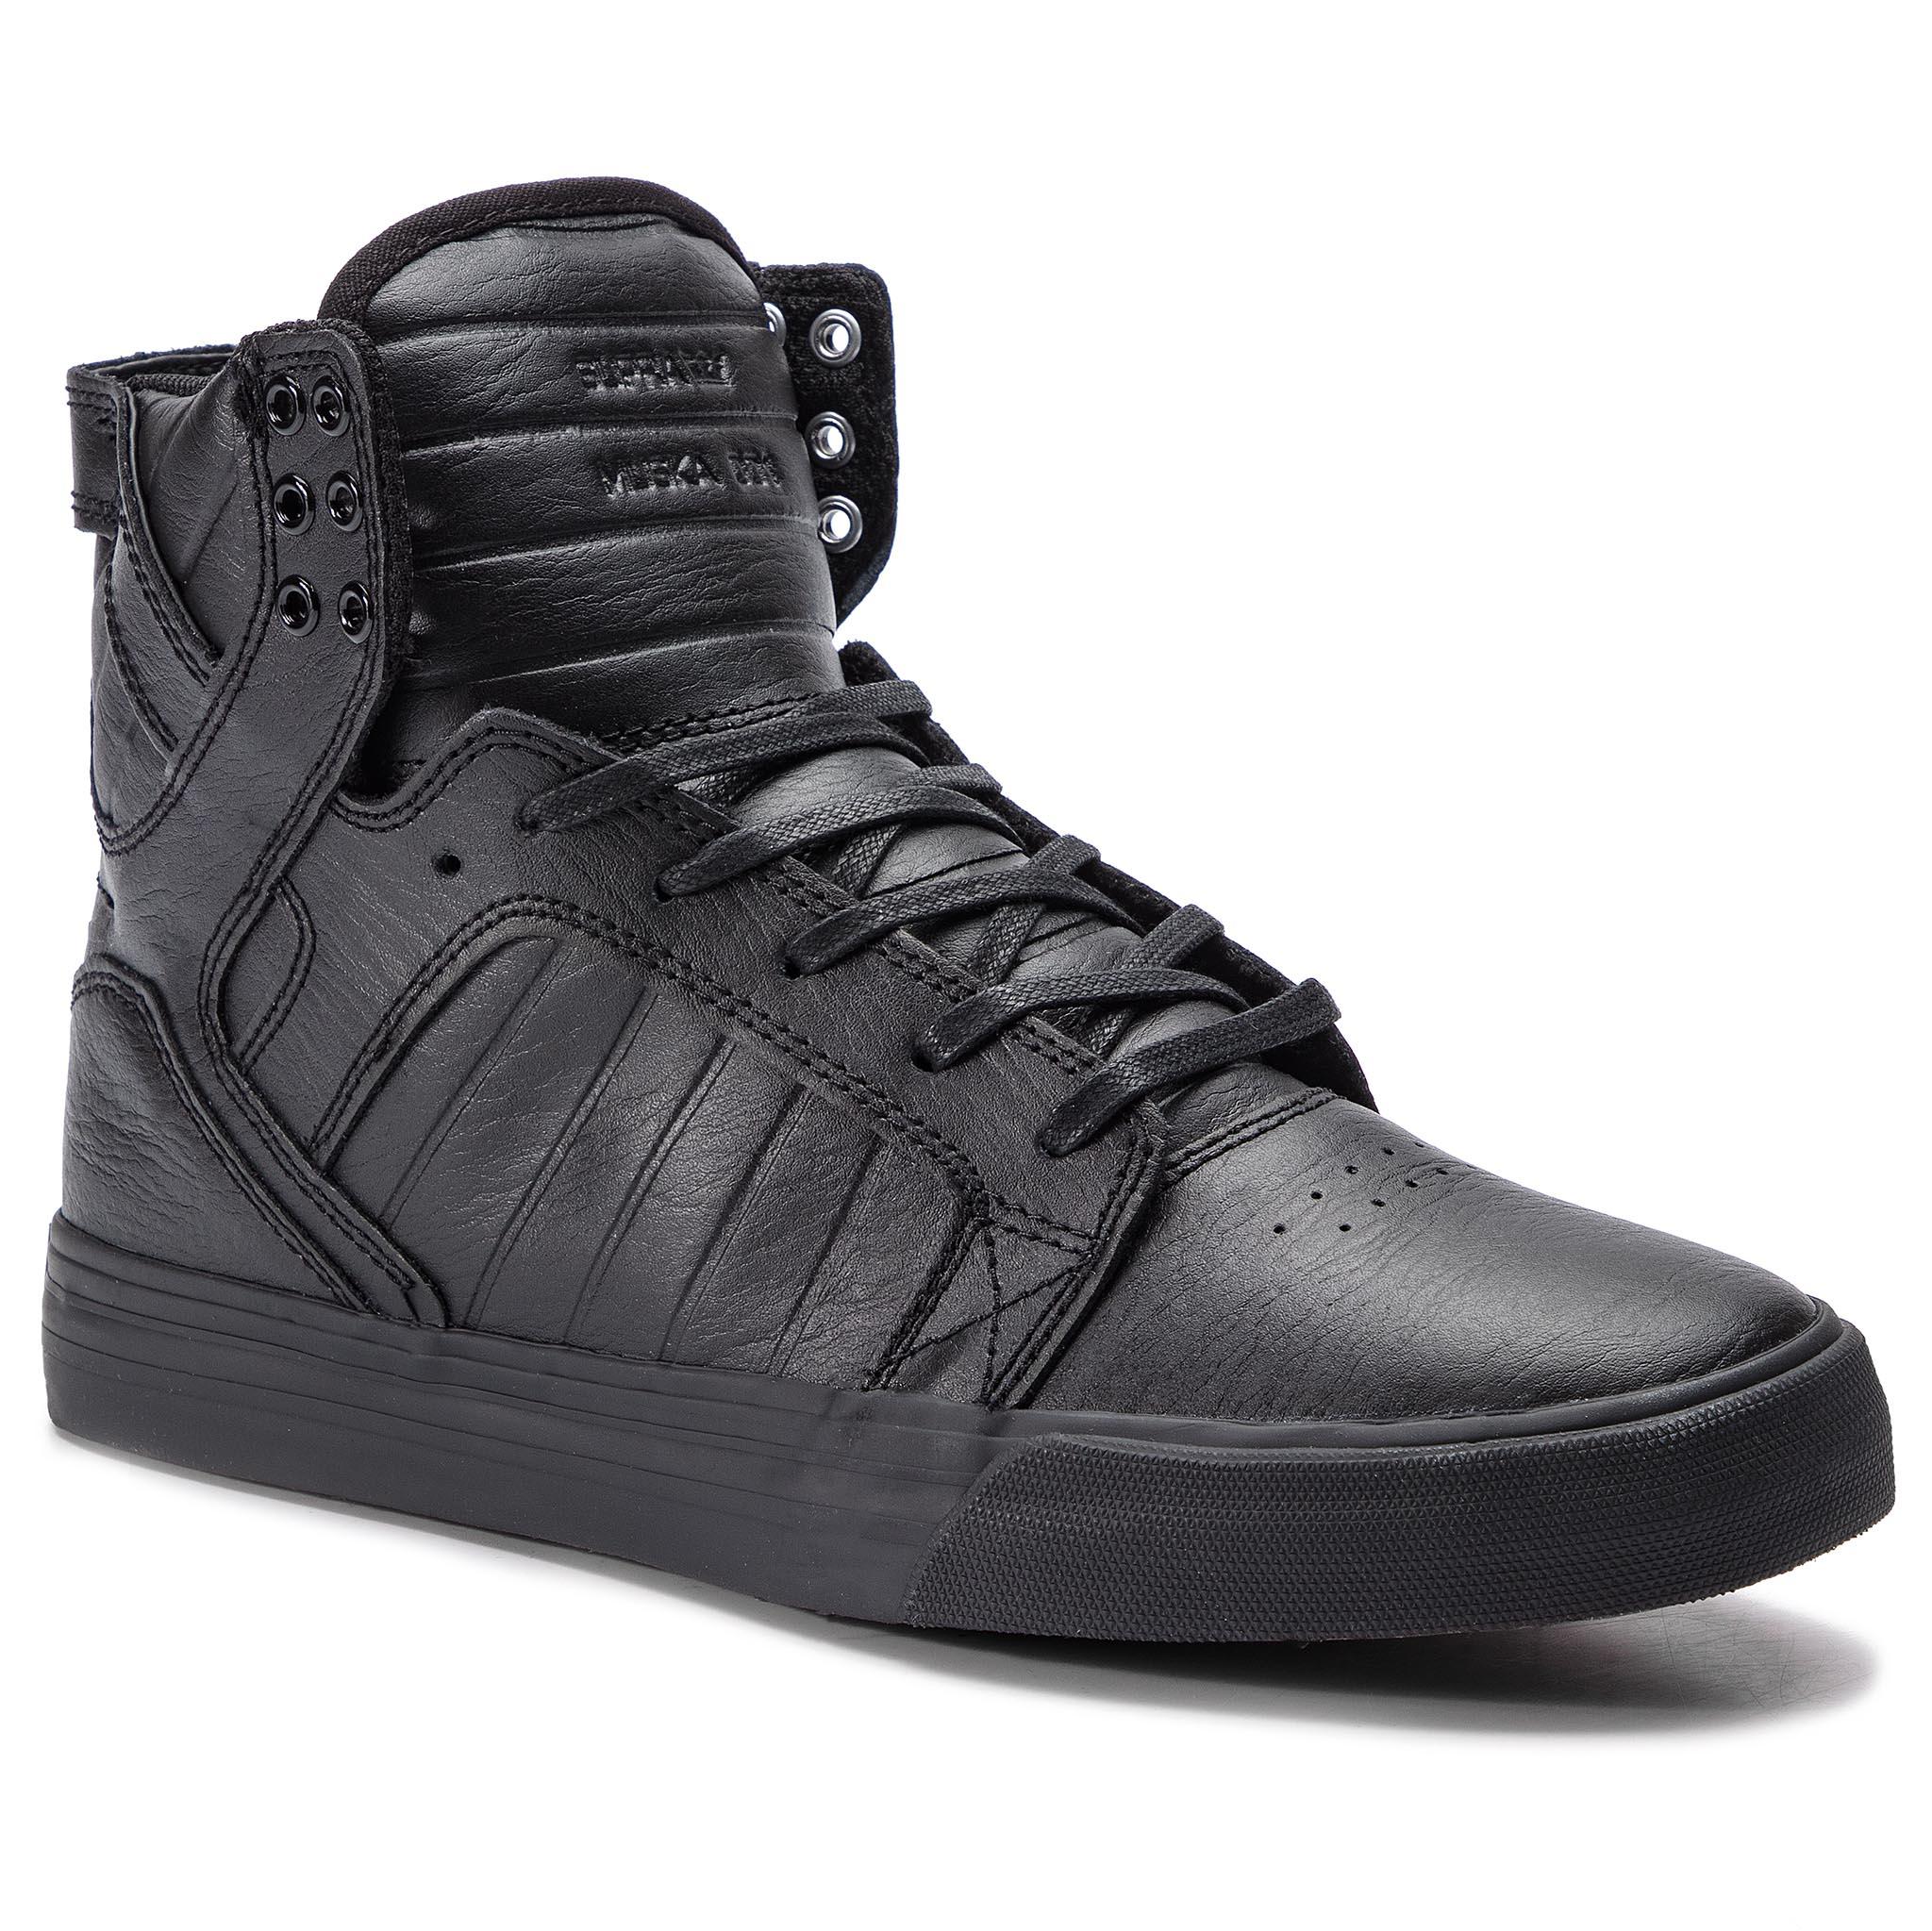 Sneakersy SUPRA - Skytop 08003-081-M Black/Black/Red